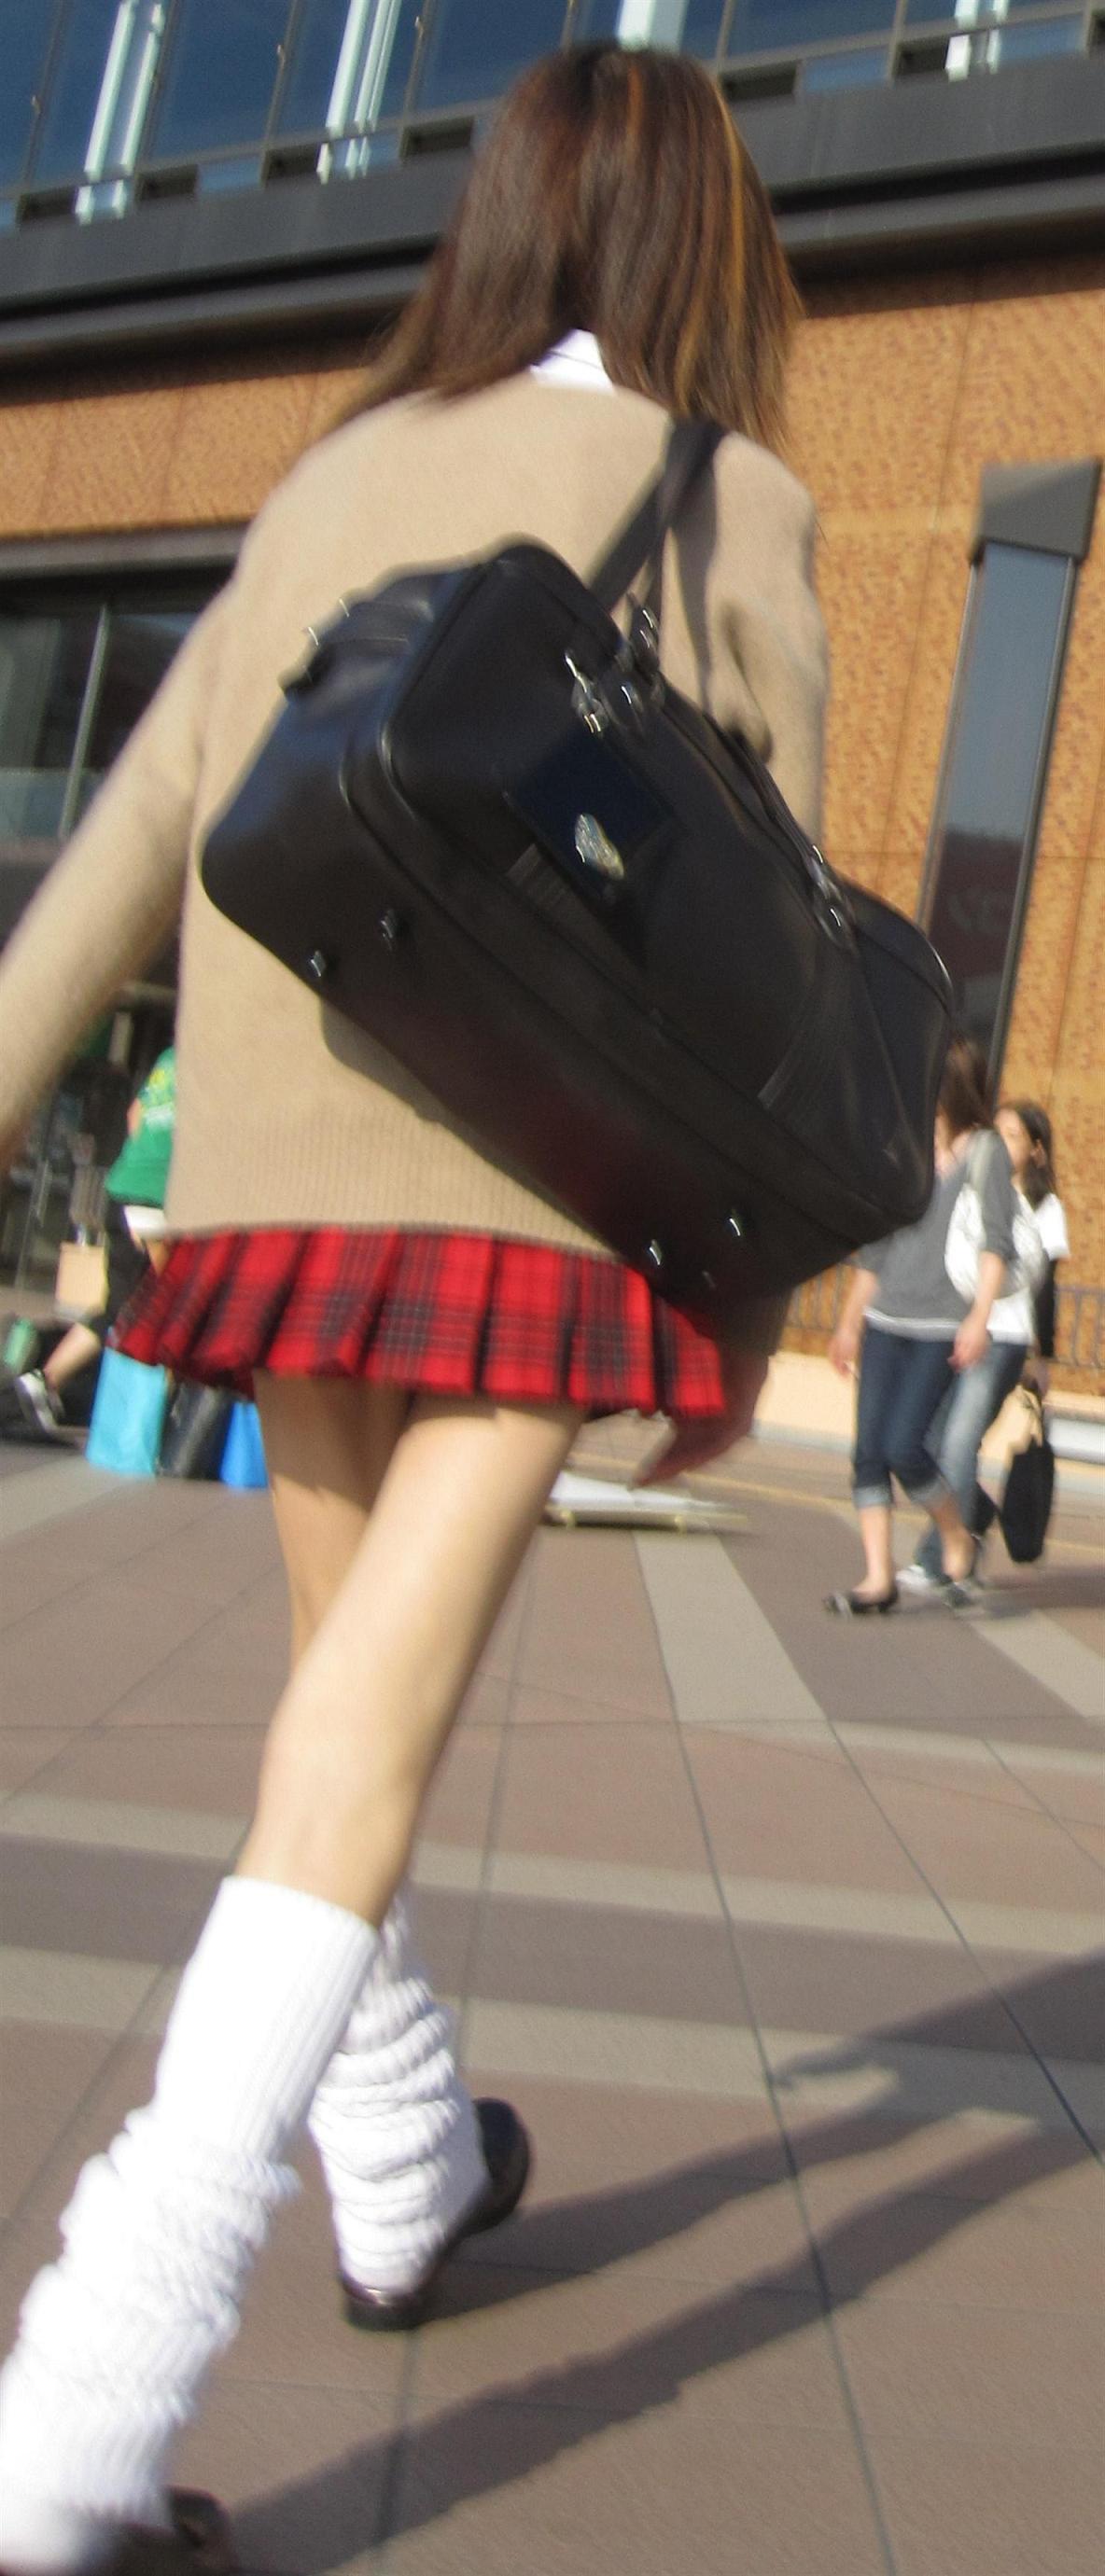 【JK街撮り】ムッチリとはまた違う色香wwwポ○キーみたいな細脚のJKたち 01